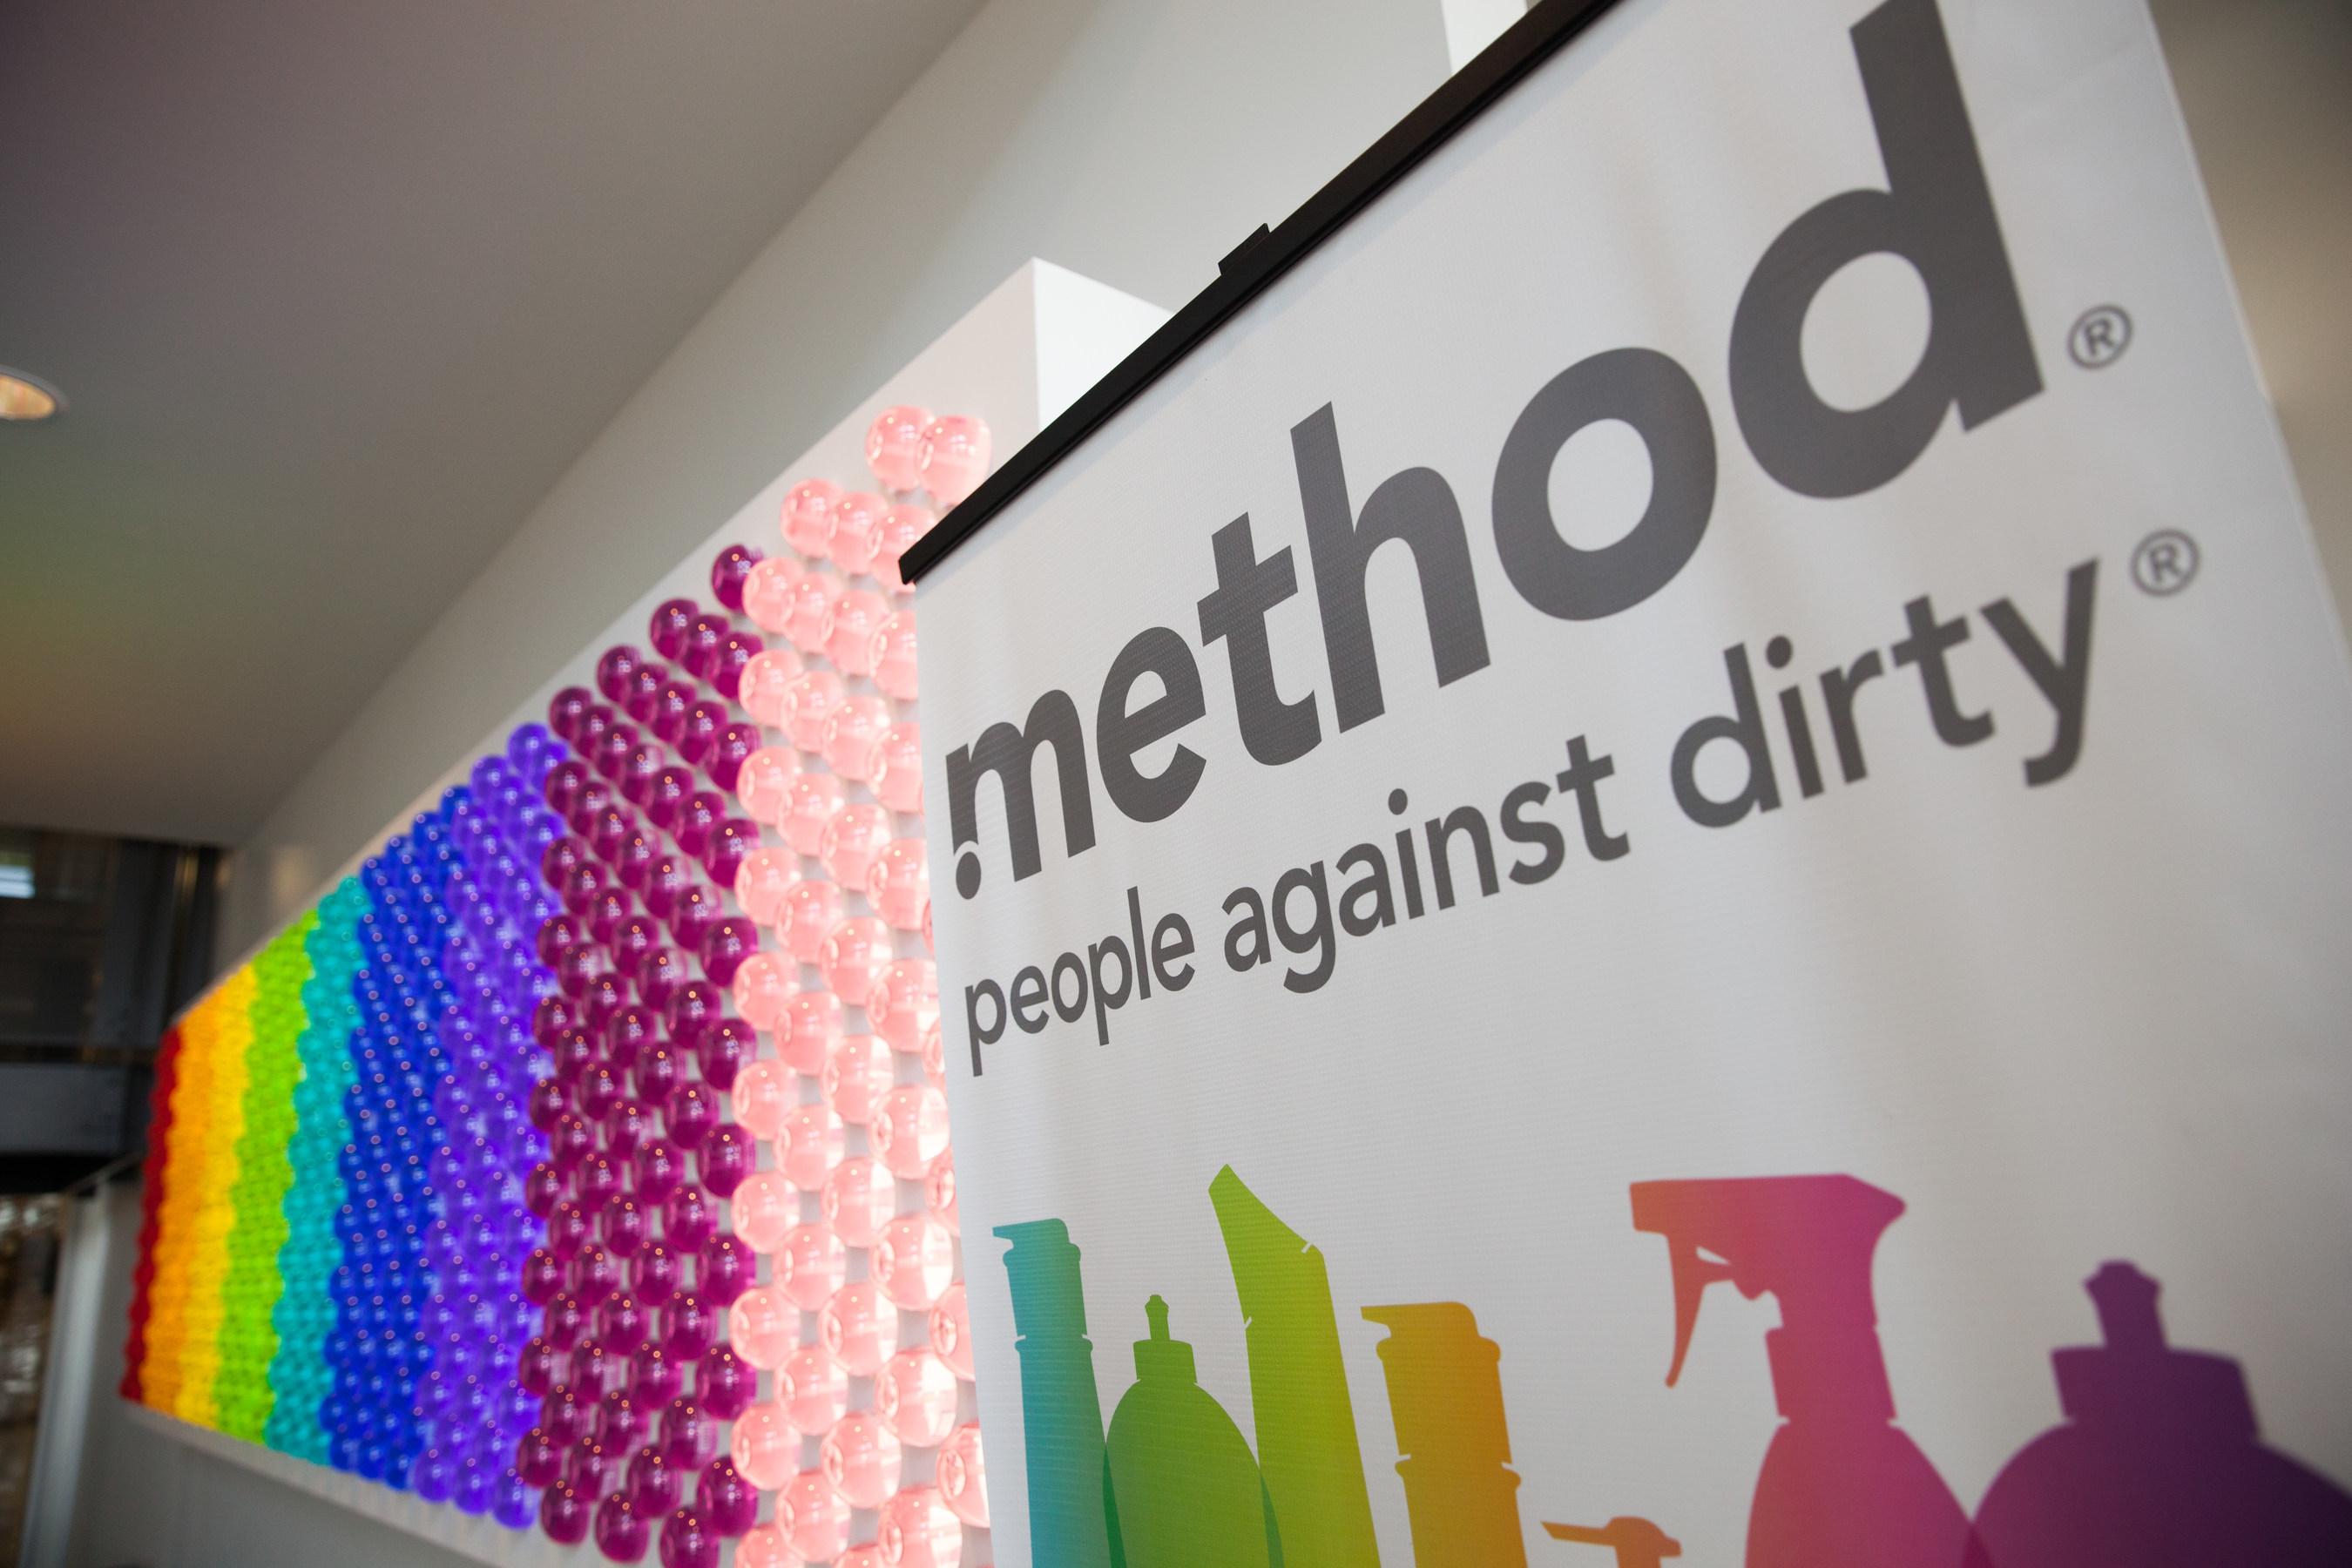 530 backlit Method bottles decorating the factory's lobby.